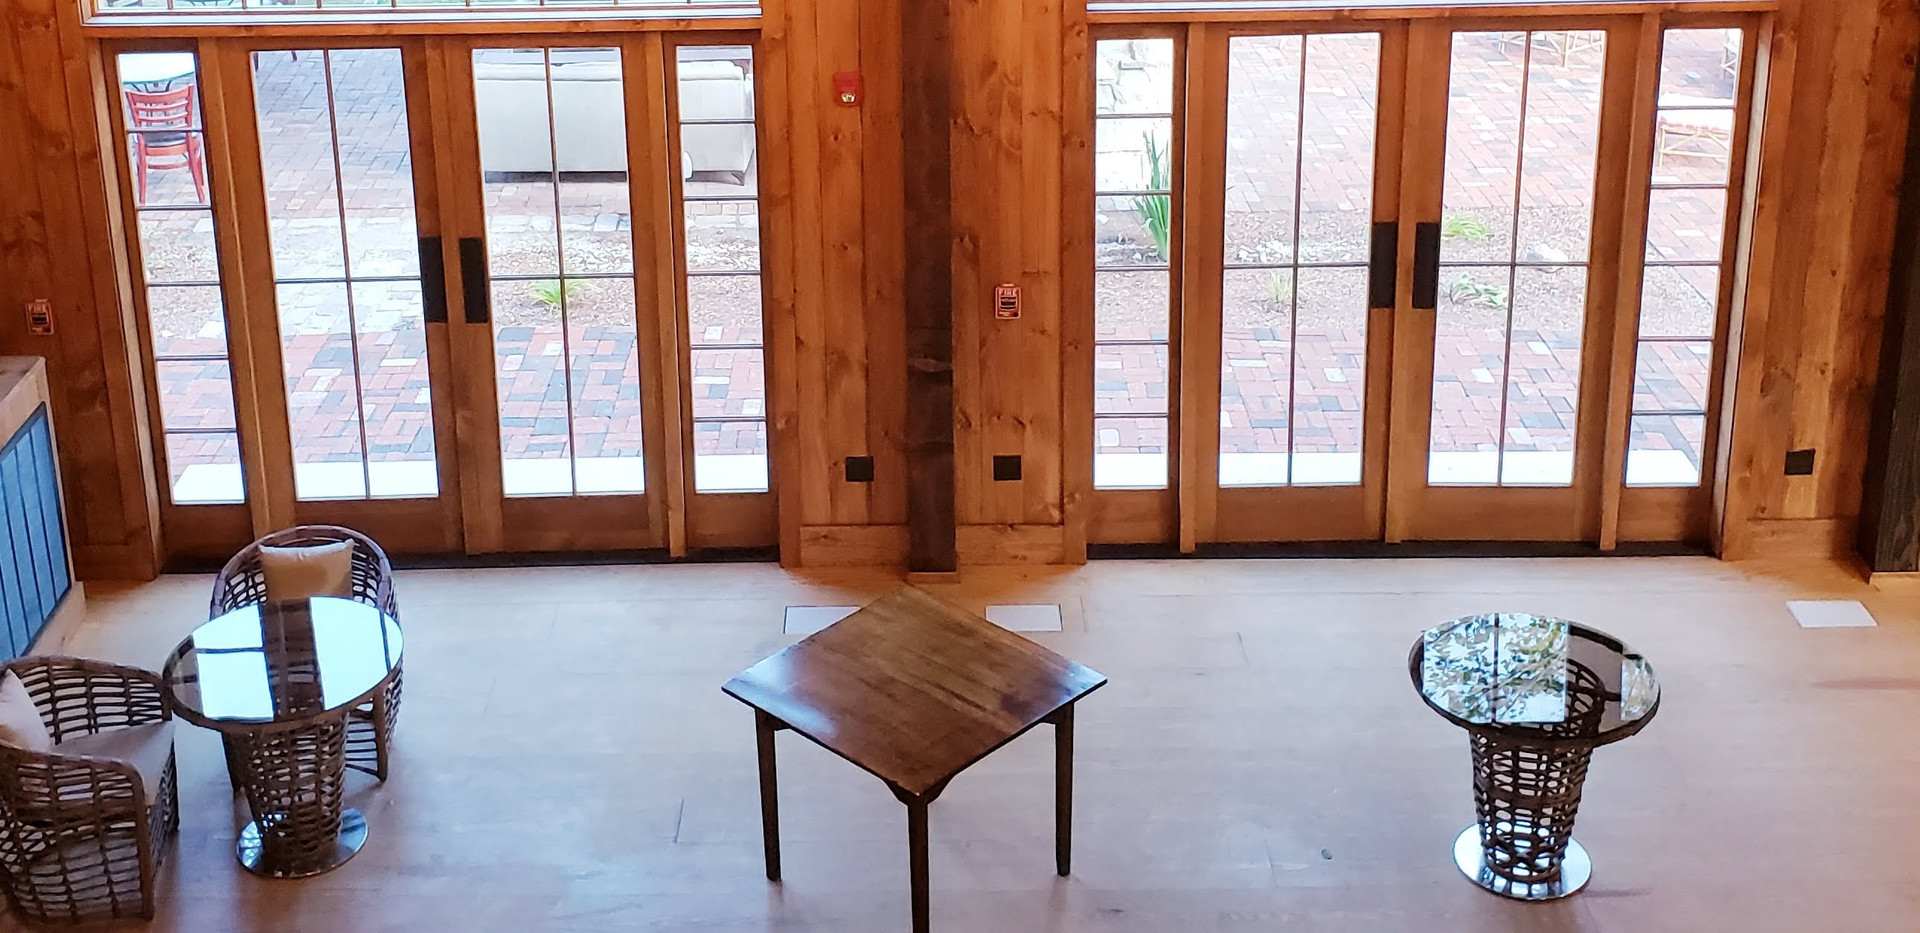 Preserve at Chocorua Barn inside